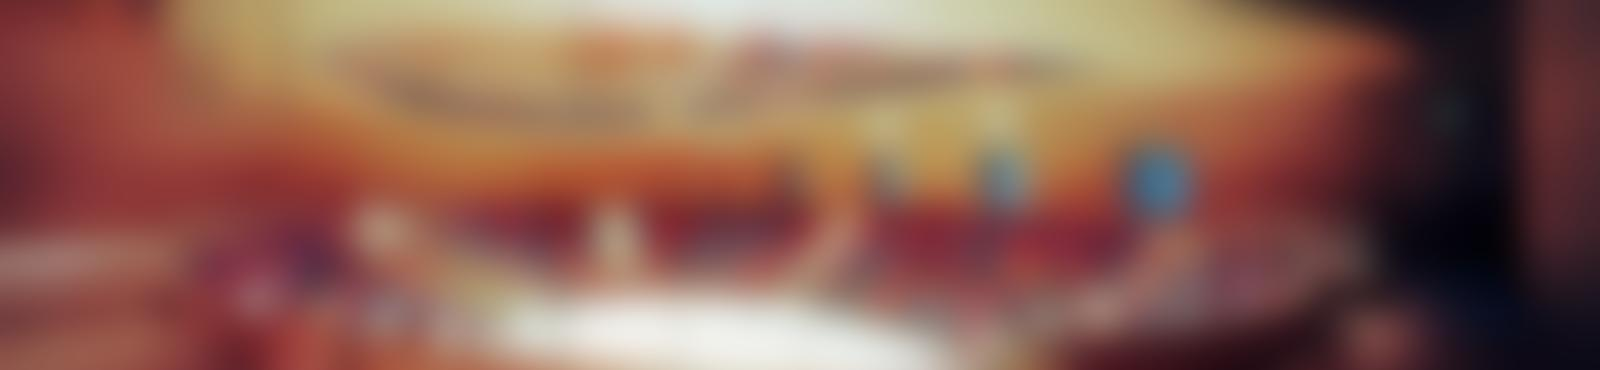 Blurred ad45ecea 0c9f 4d92 aa21 75e562f4f6b0